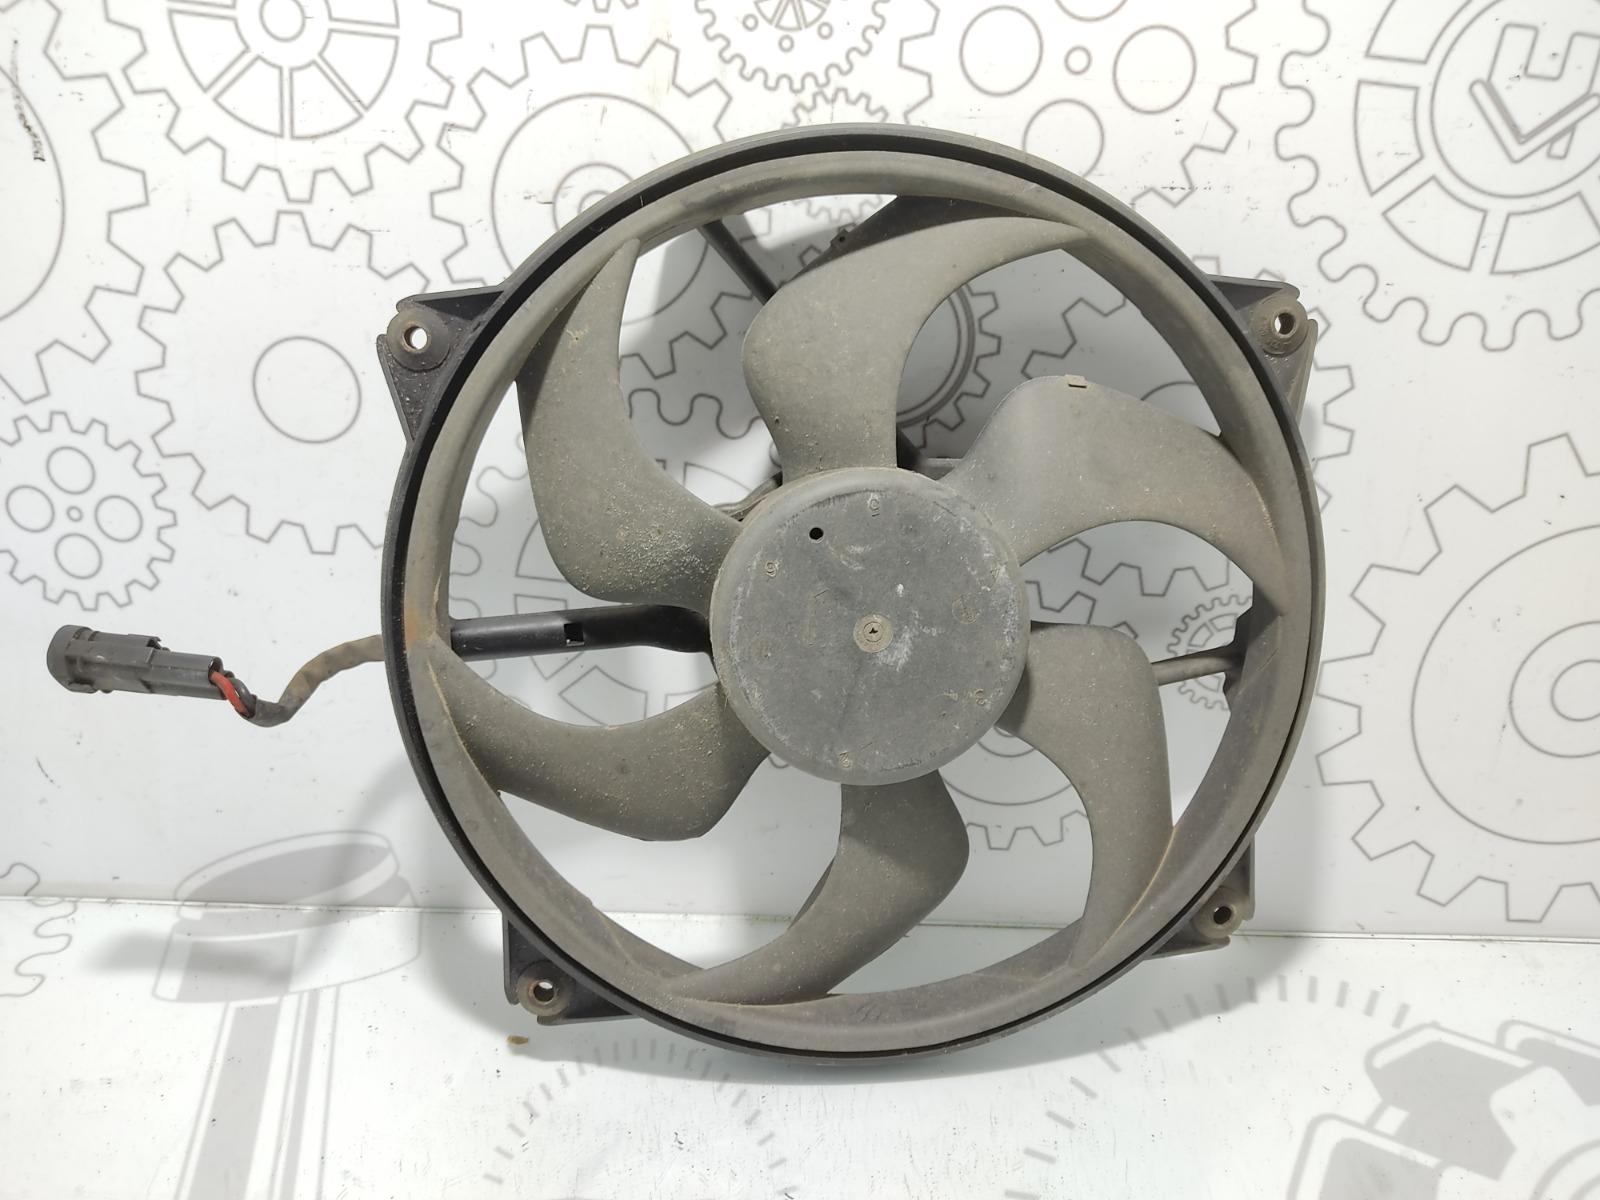 Вентилятор радиатора Peugeot 307 2.0 HDI 2003 (б/у)